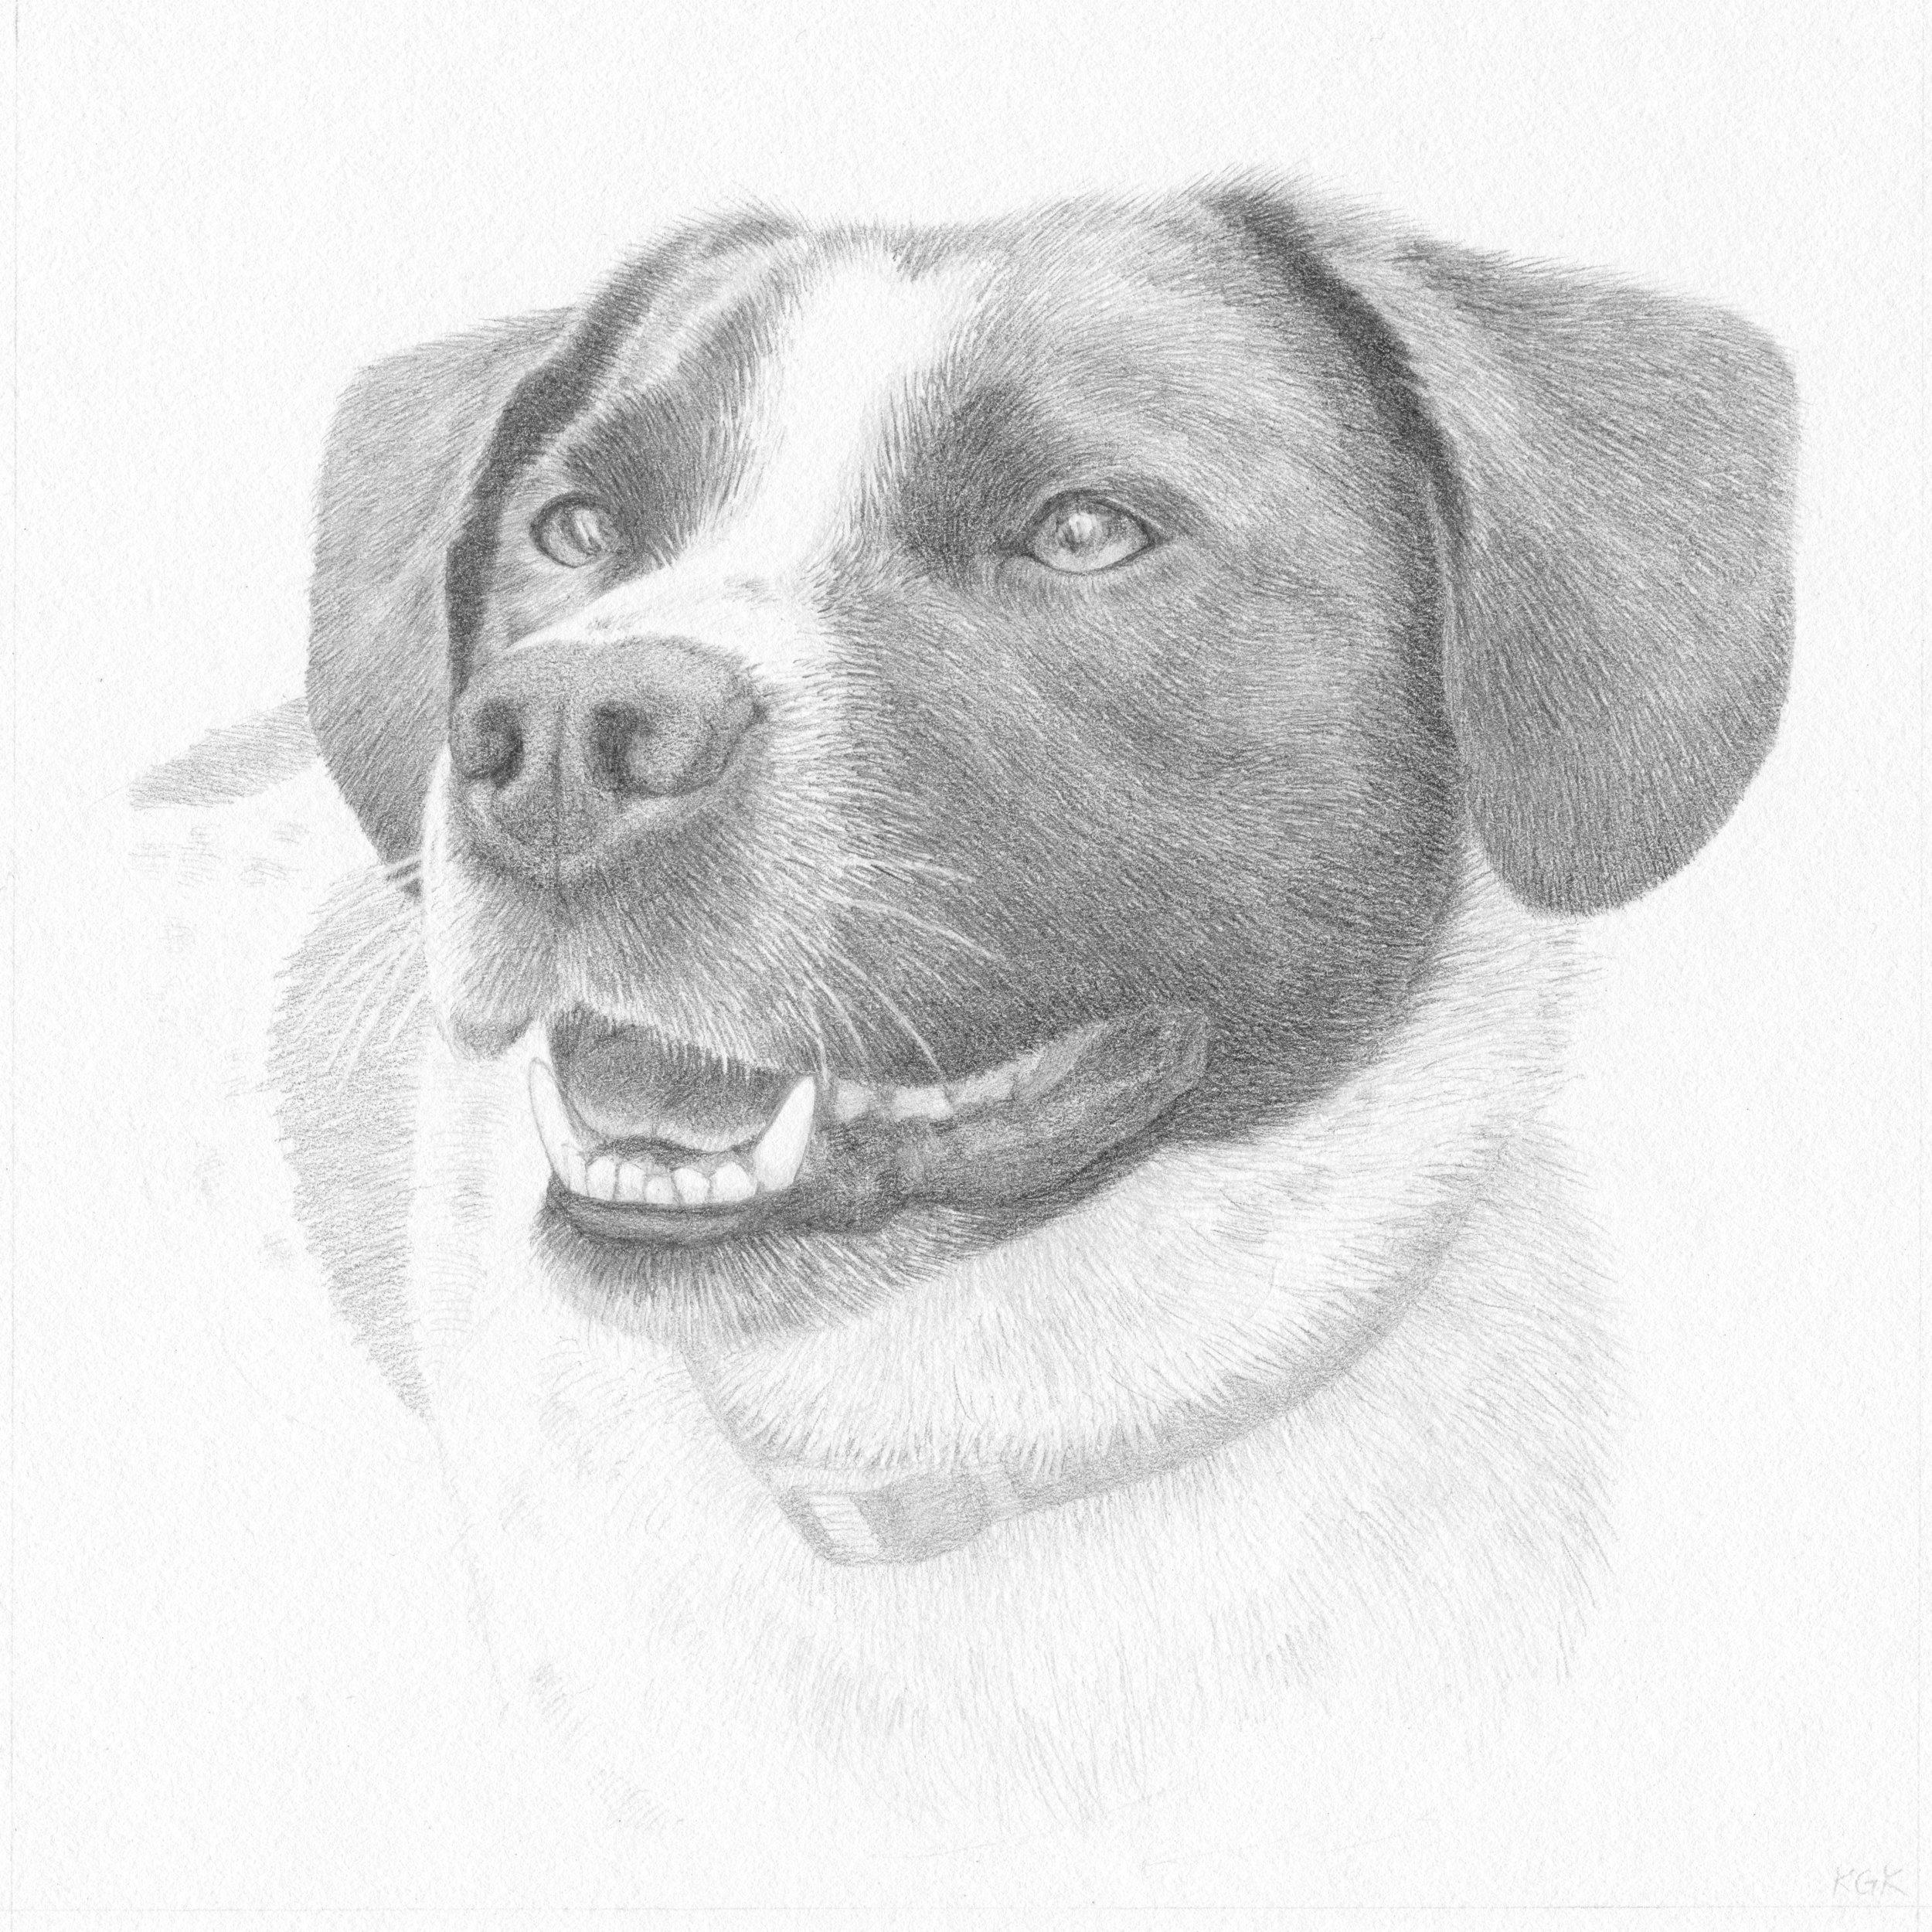 speckles portrait, copyright katie koch.jpg